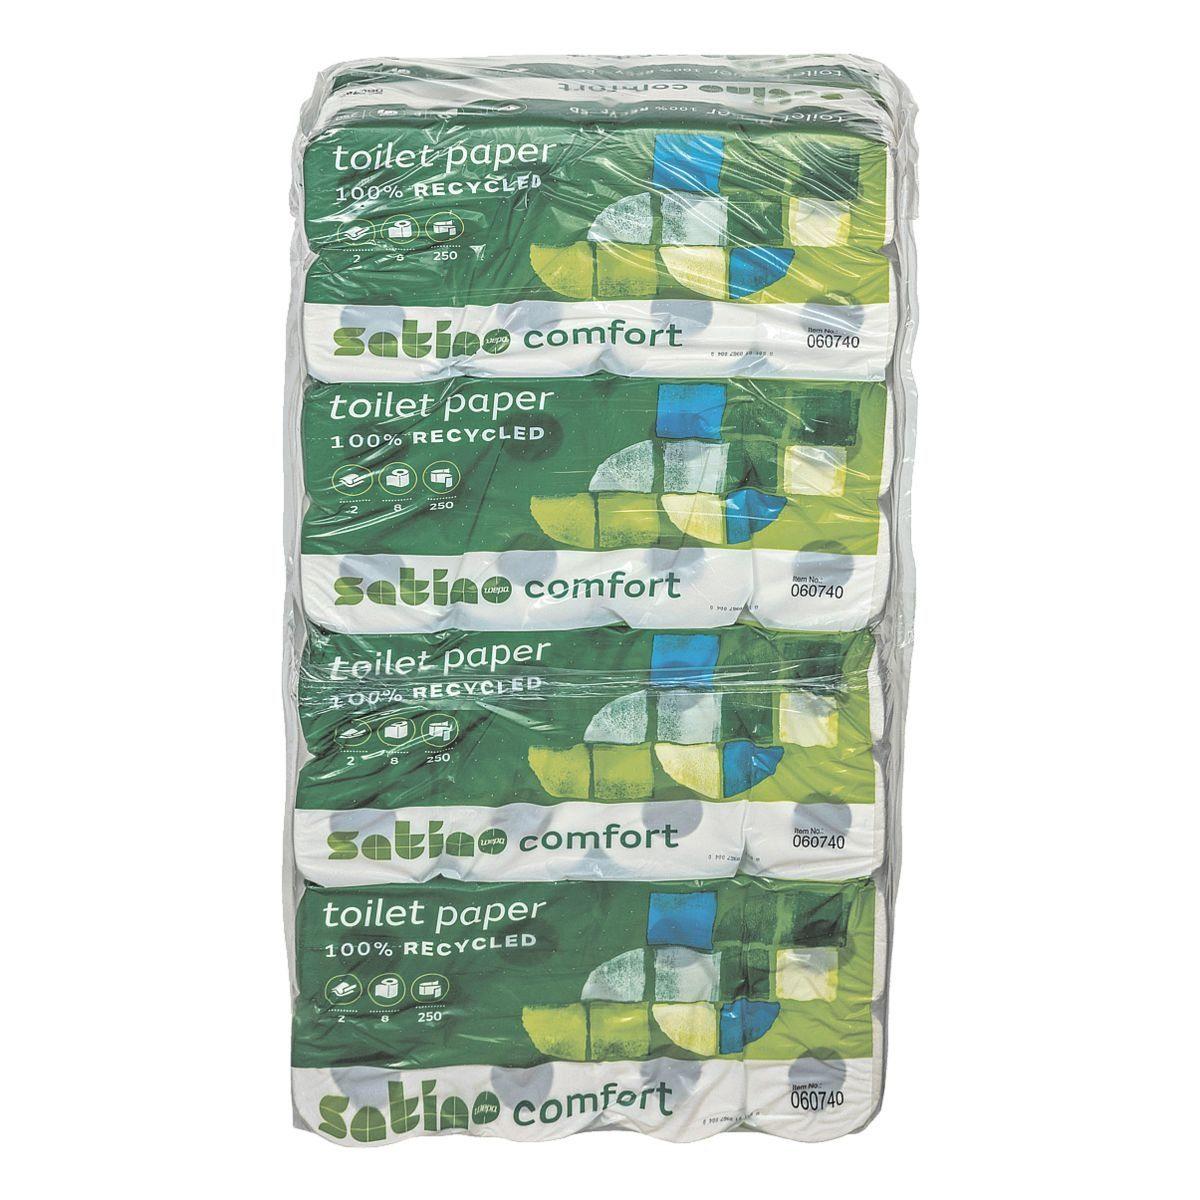 WEPACOMFORT Toilettenpapier 2-lagig - 64 Rollen